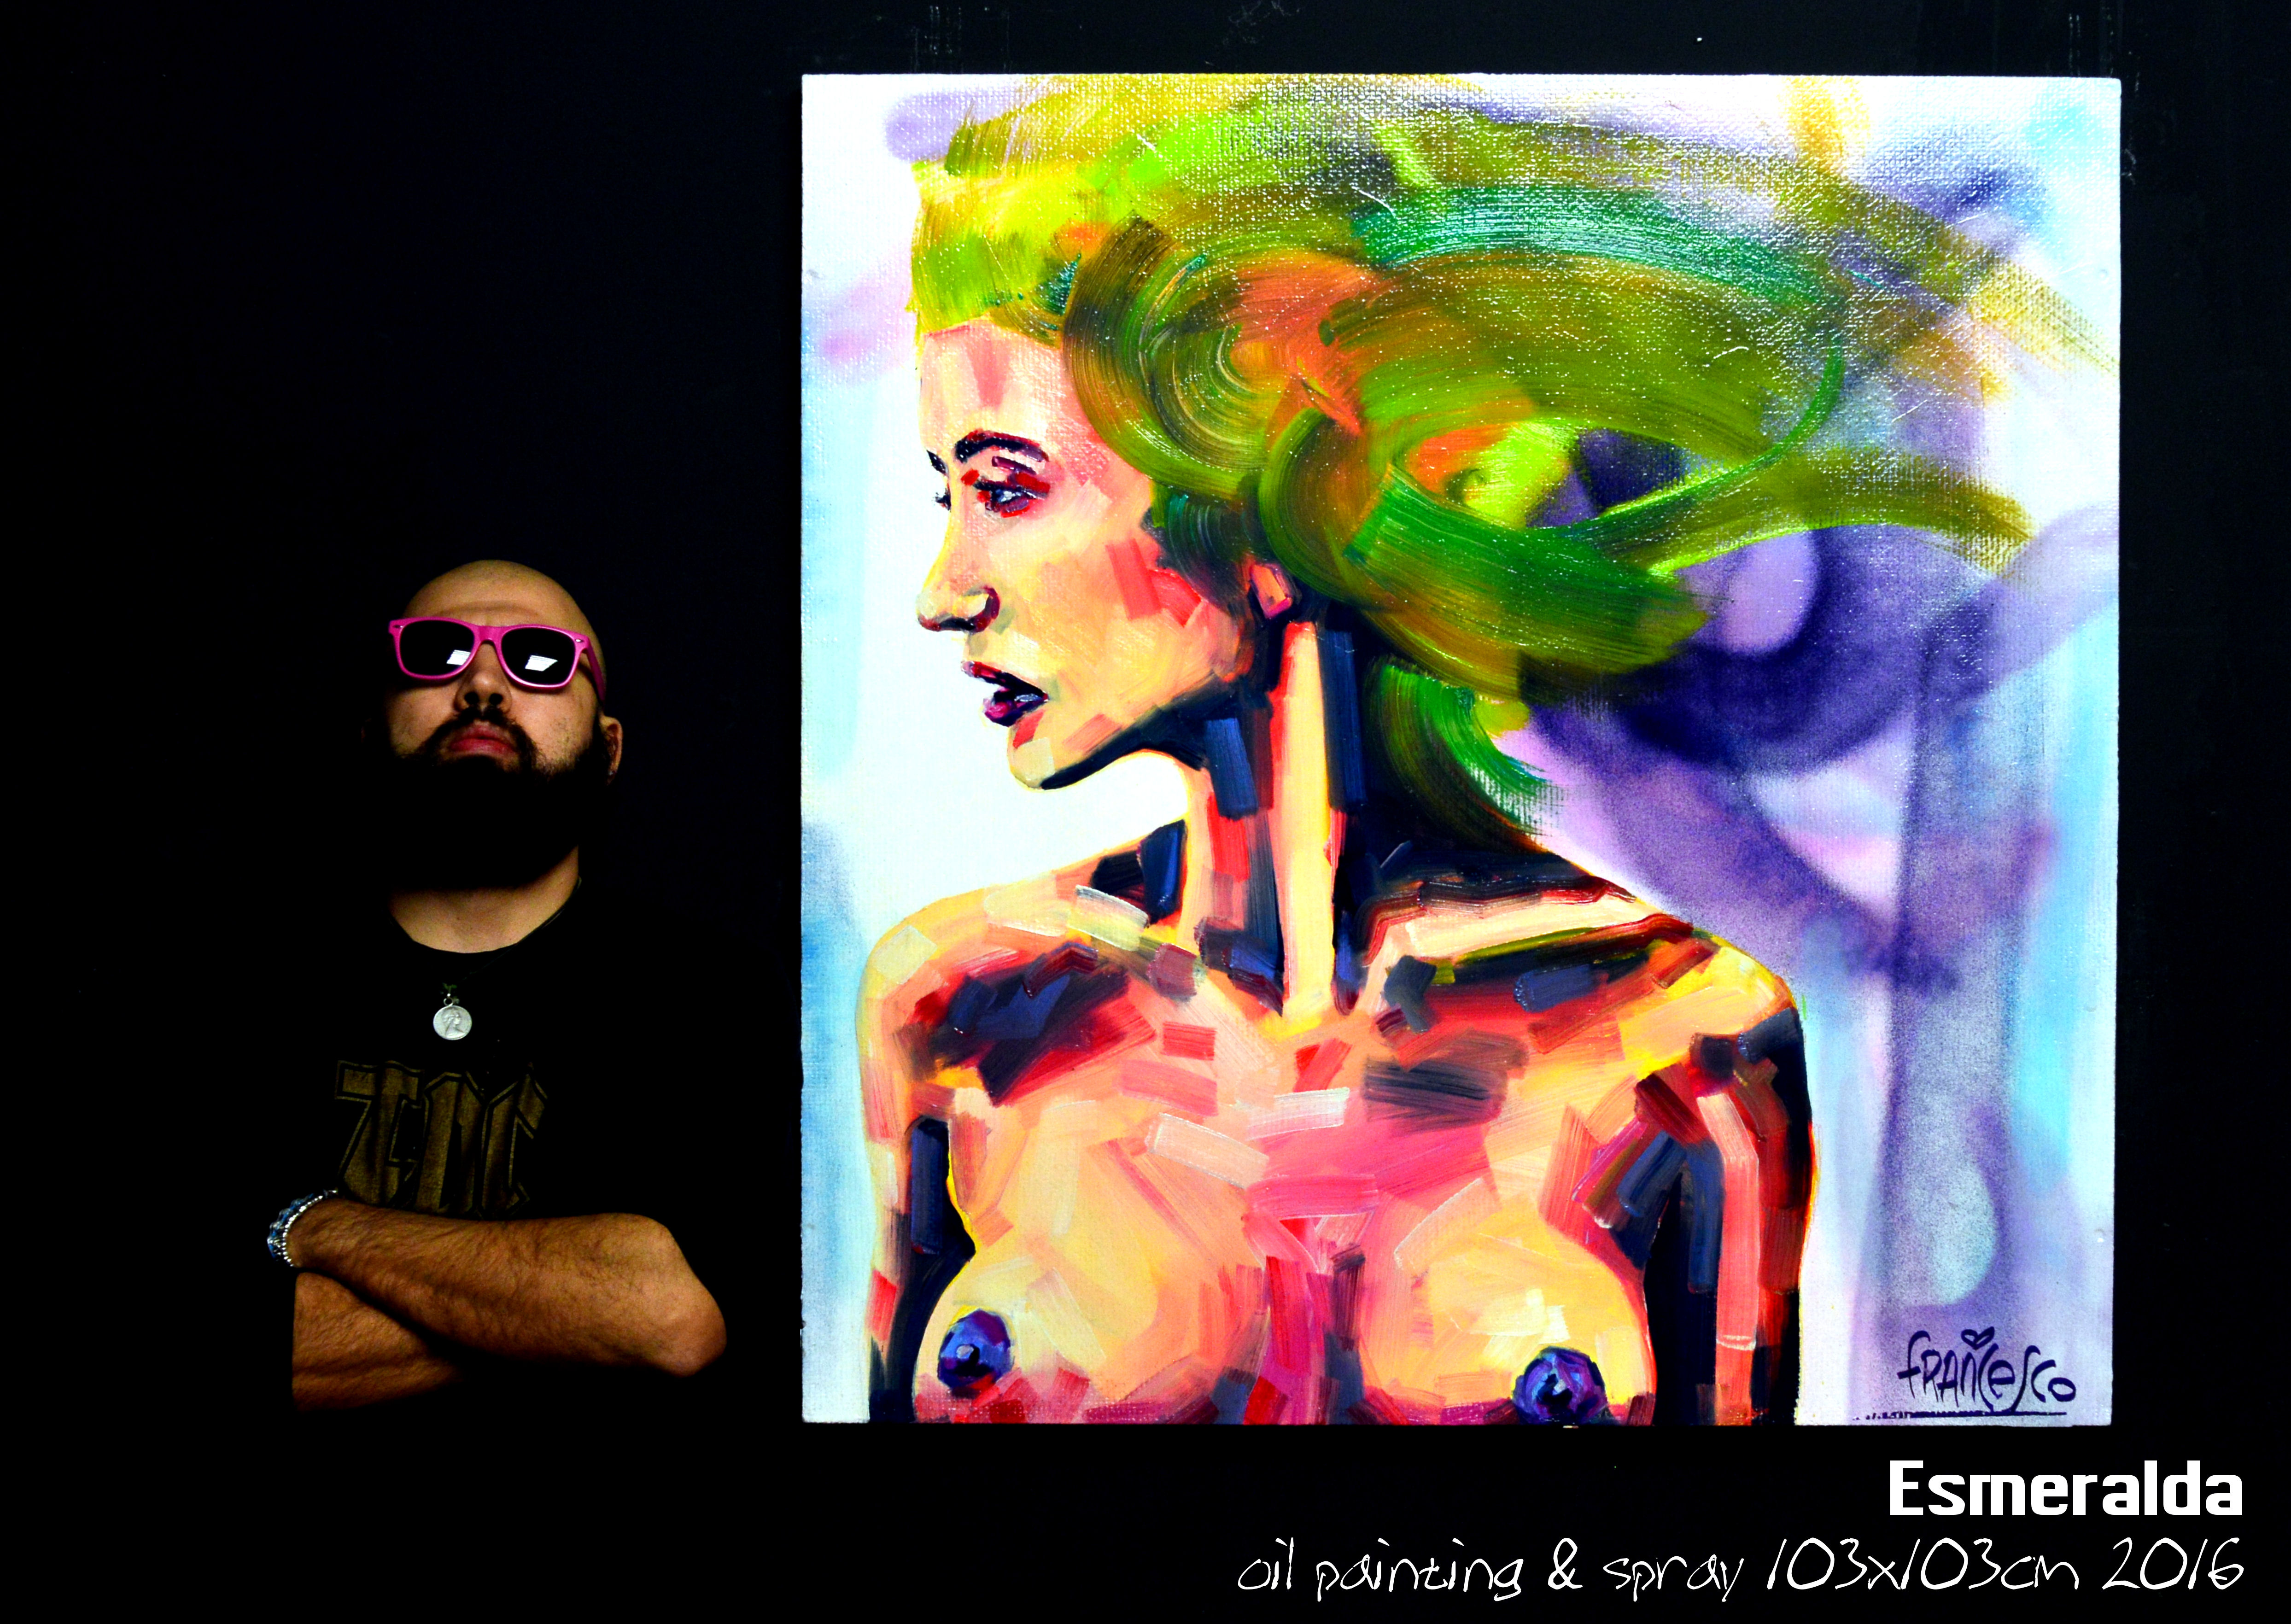 Francesco NEO_Esmeralda_103x103_2016_A3.jpg